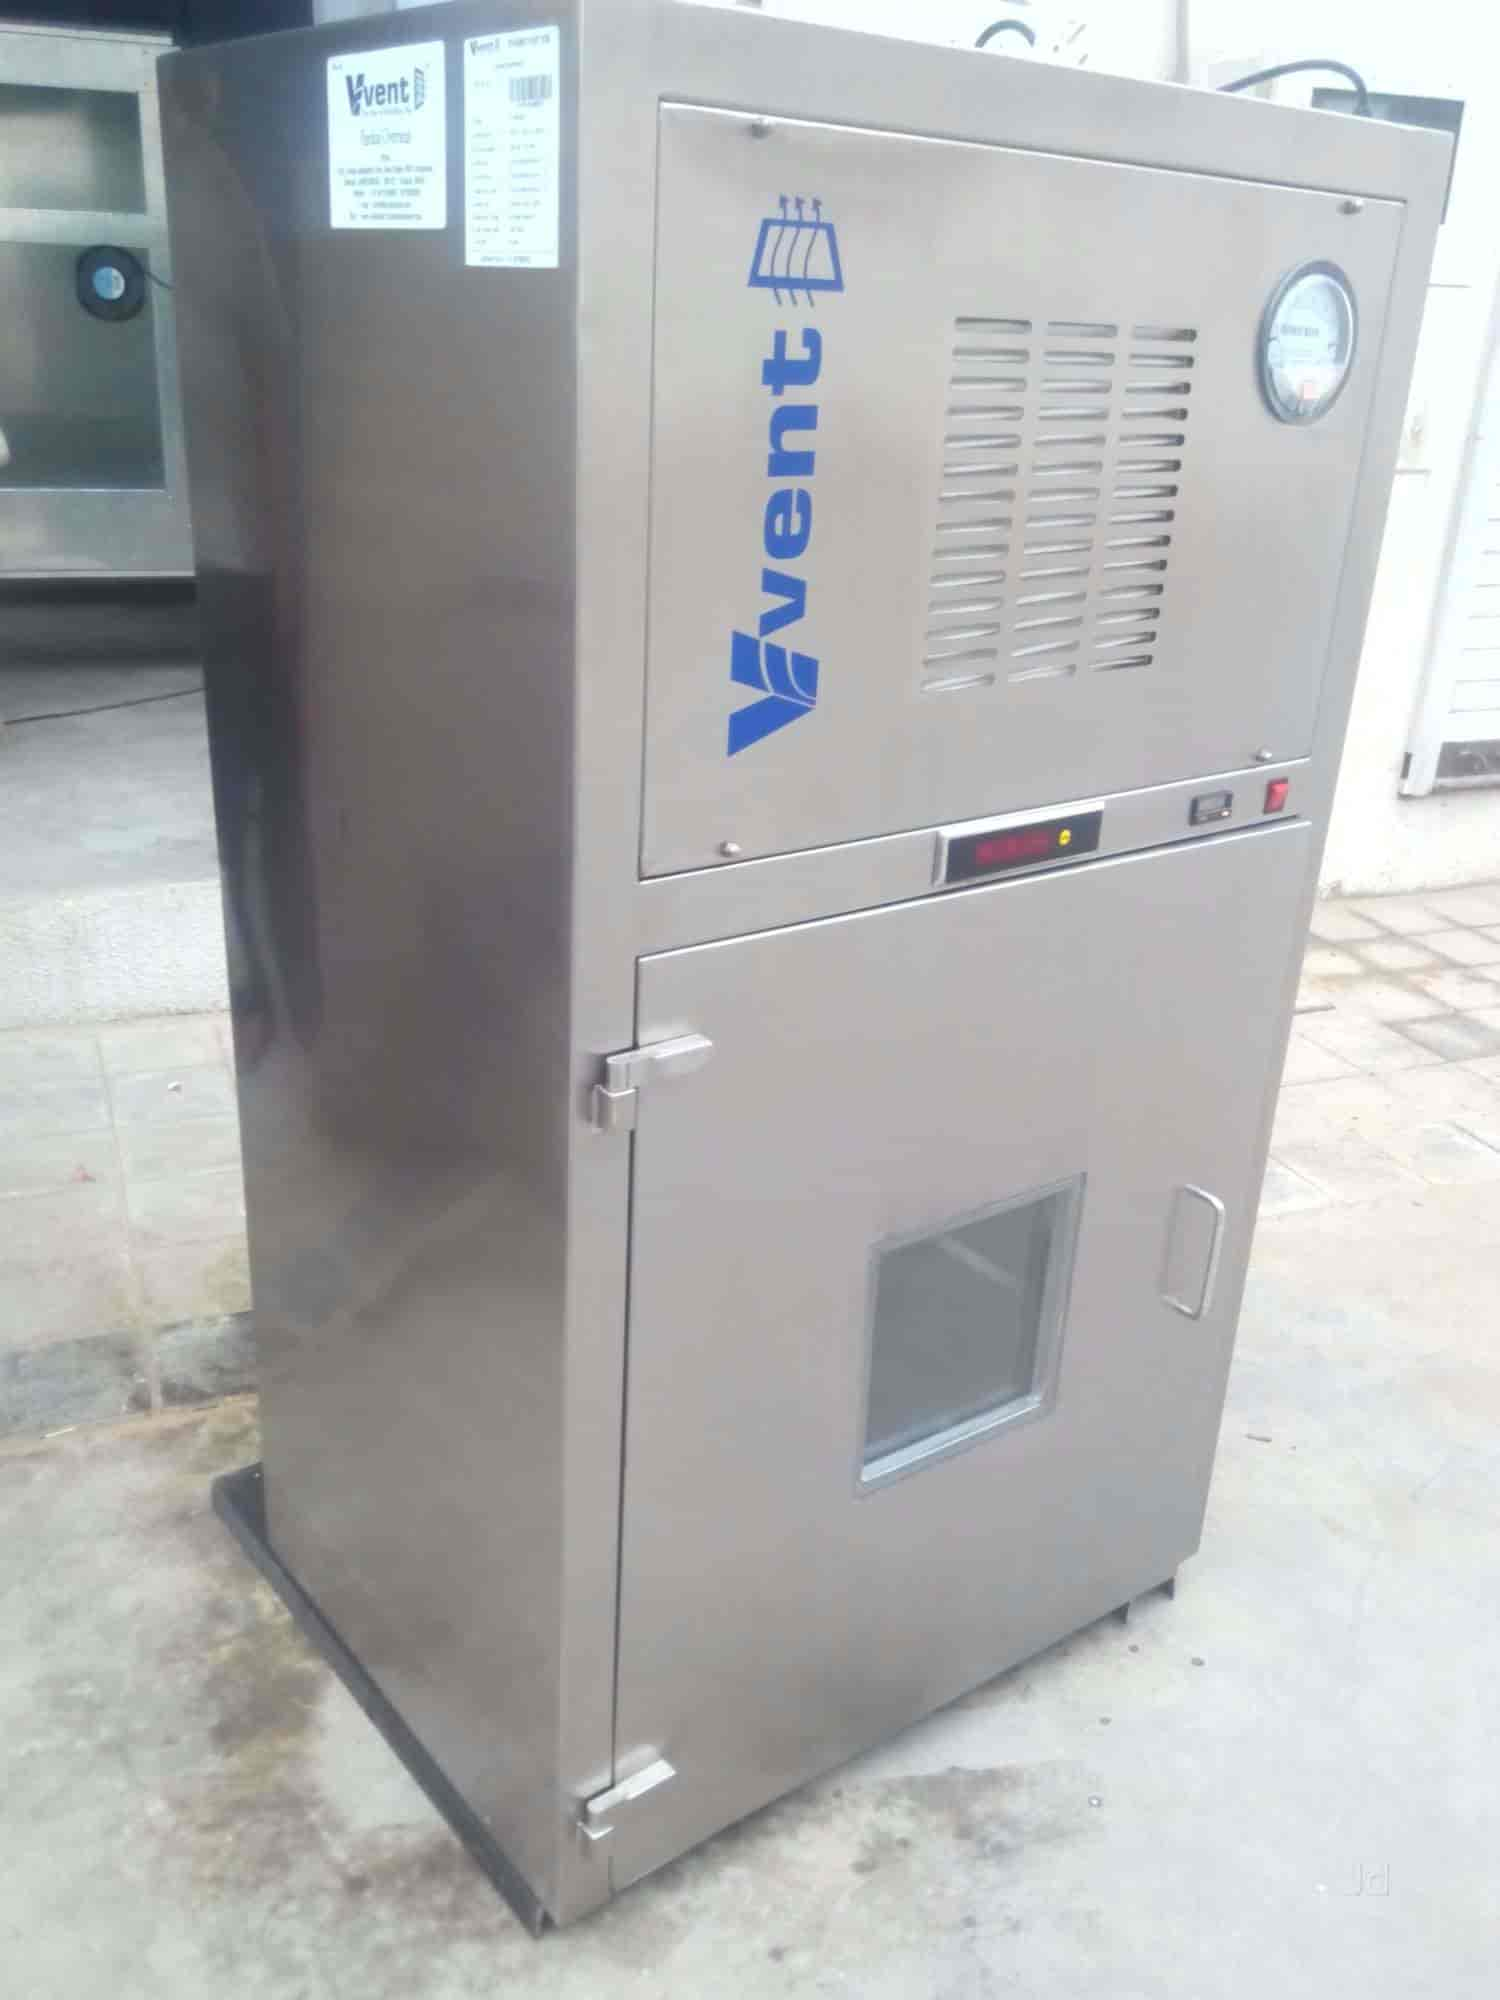 Vent Filter Tech Pvt  Ltd , Vatva - Pharmaceutical Machinery